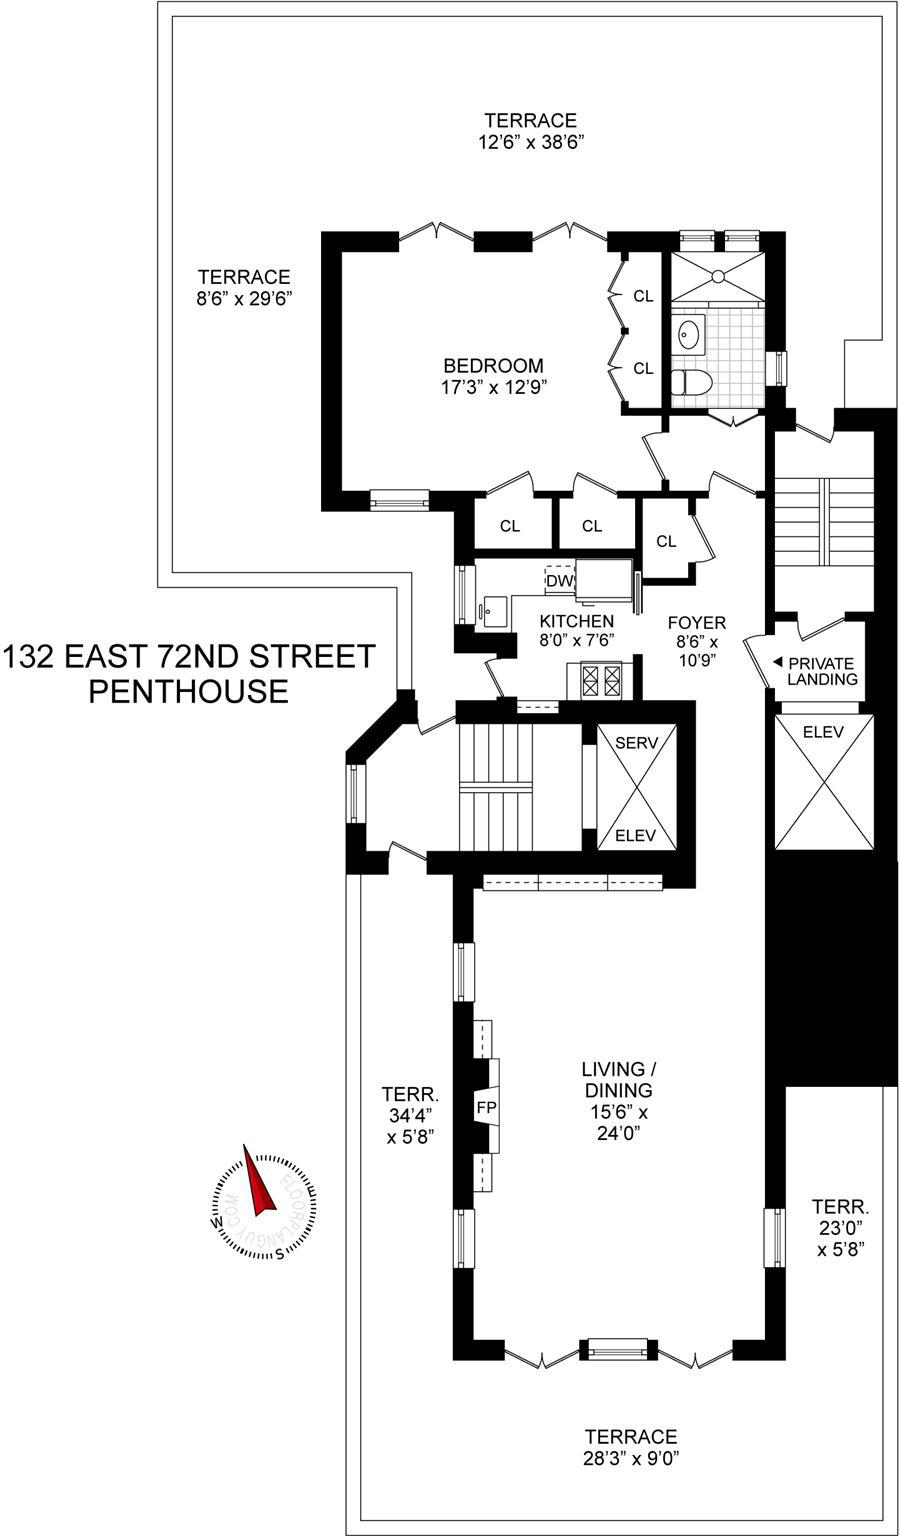 132 East 72nd Street